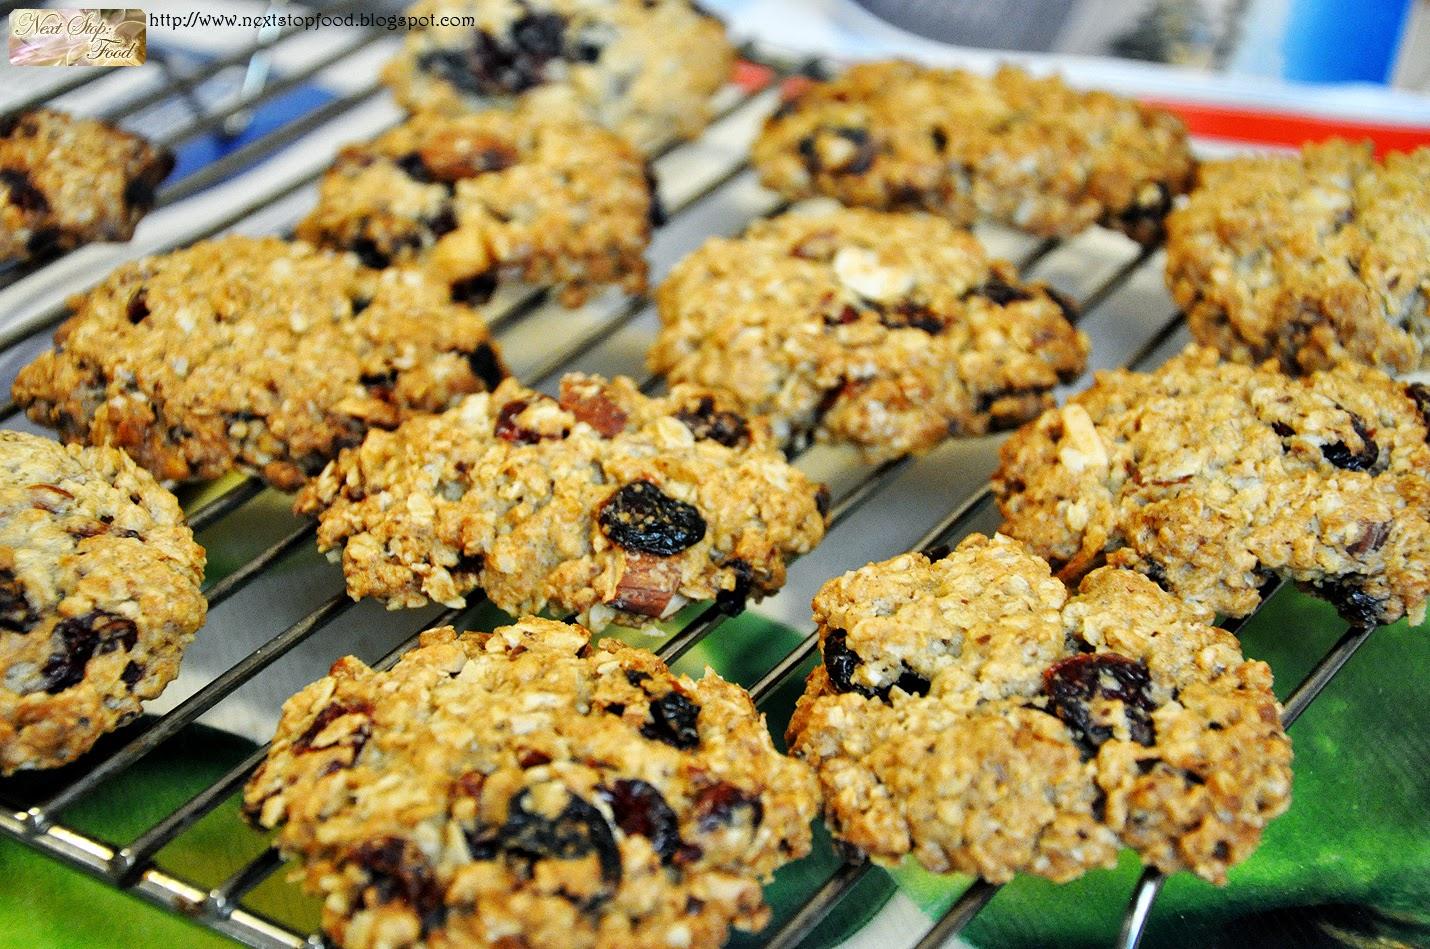 http://nextstopfood.blogspot.com.au/2012/08/home-oatmeal-cranberry-cookies.html